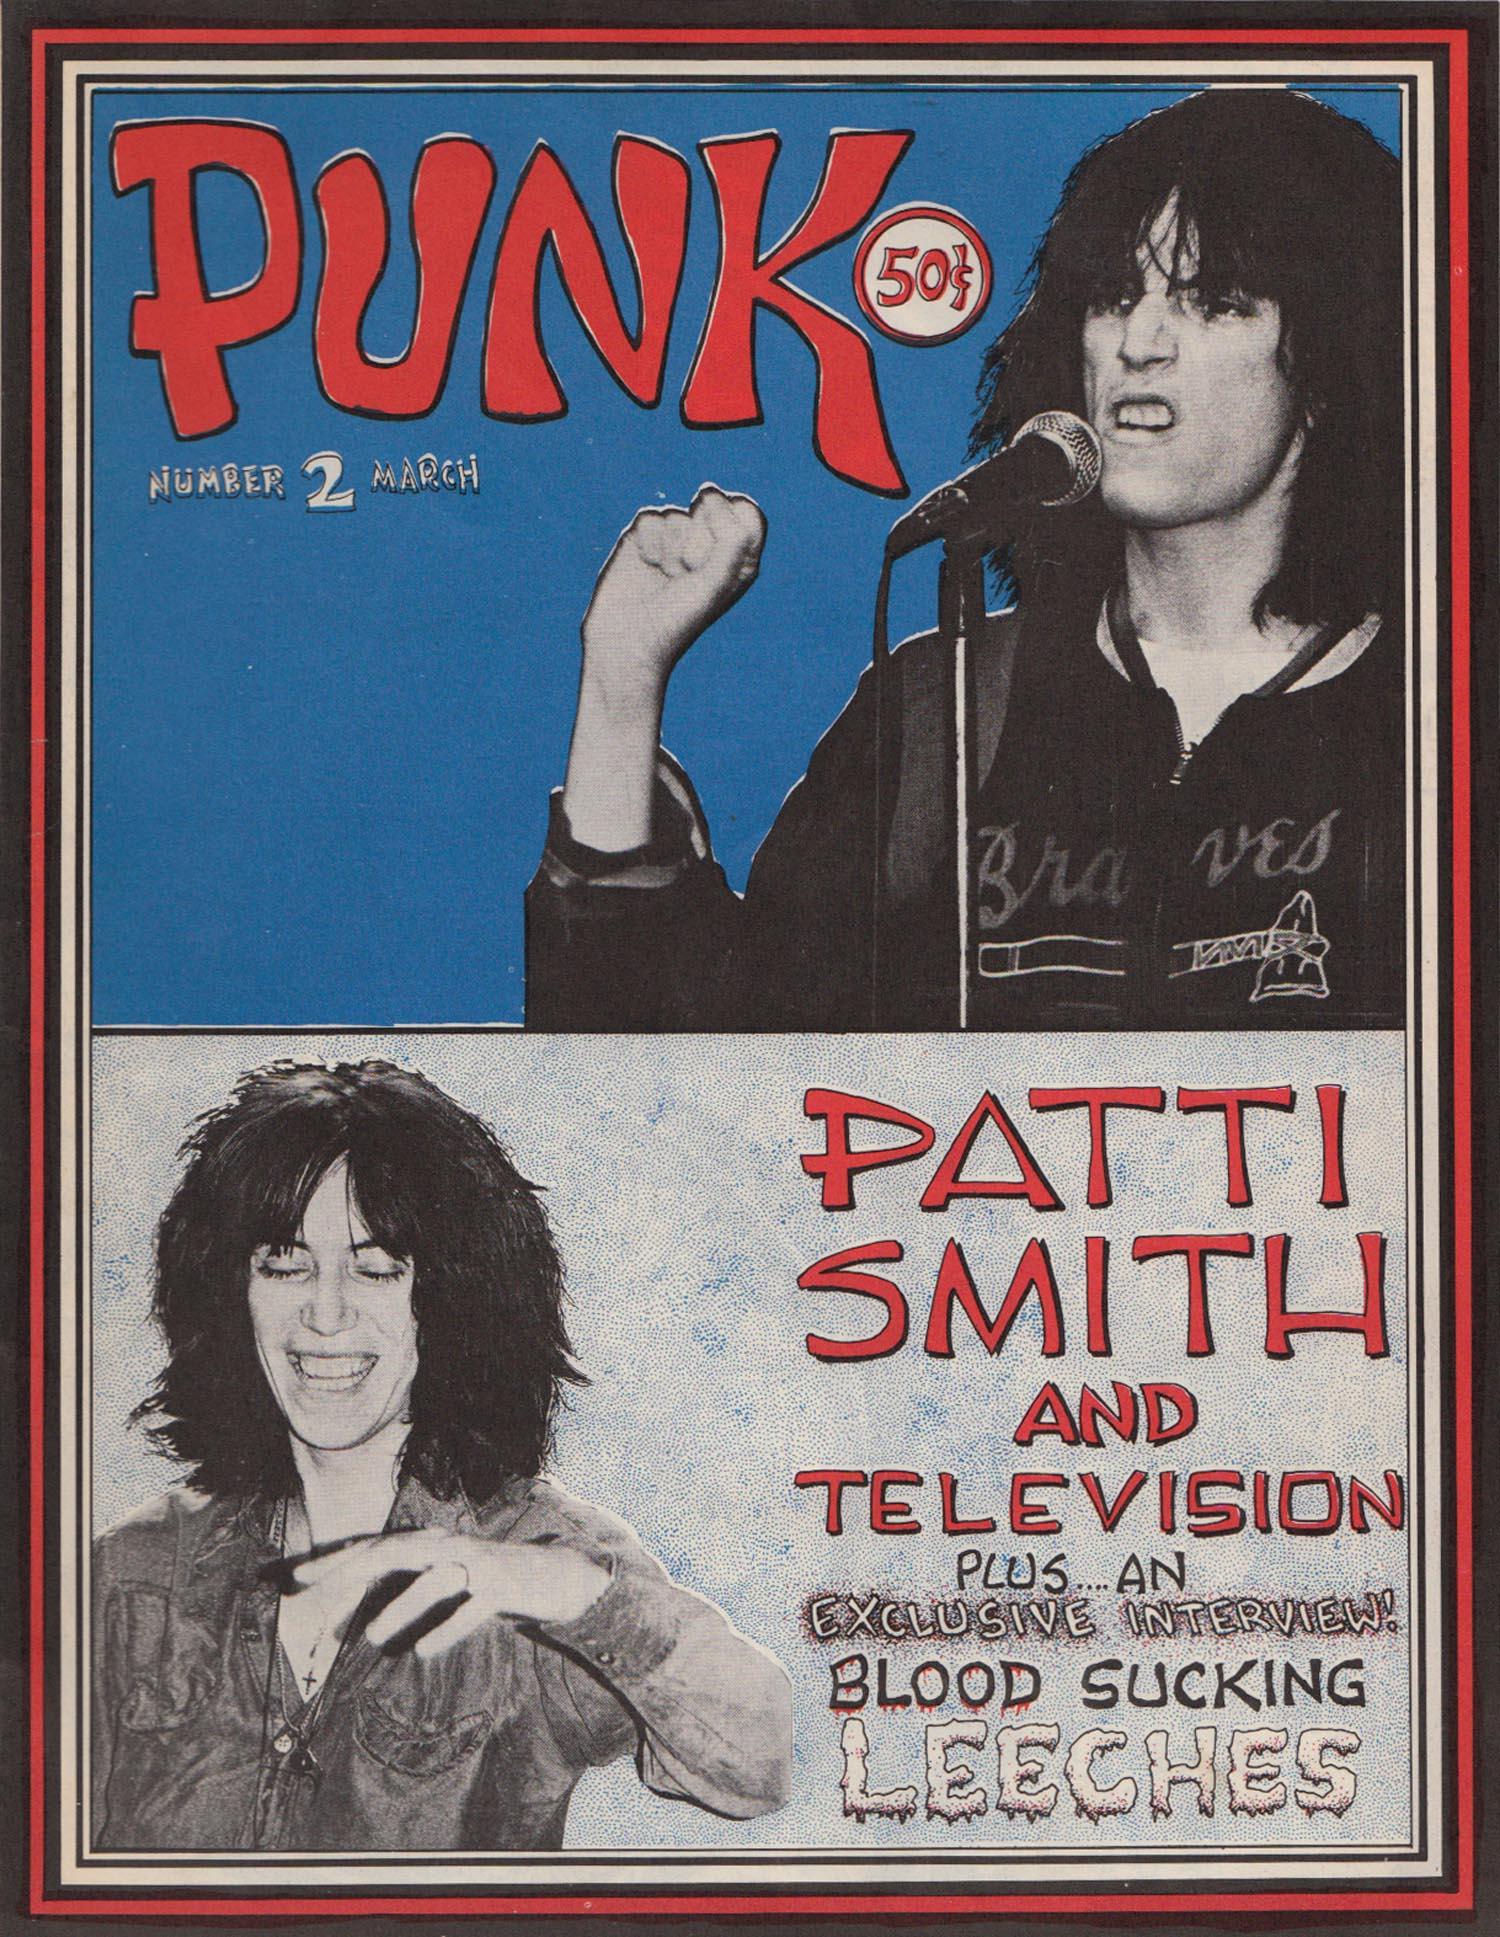 Punk Magazine, Issue 2, March 1976